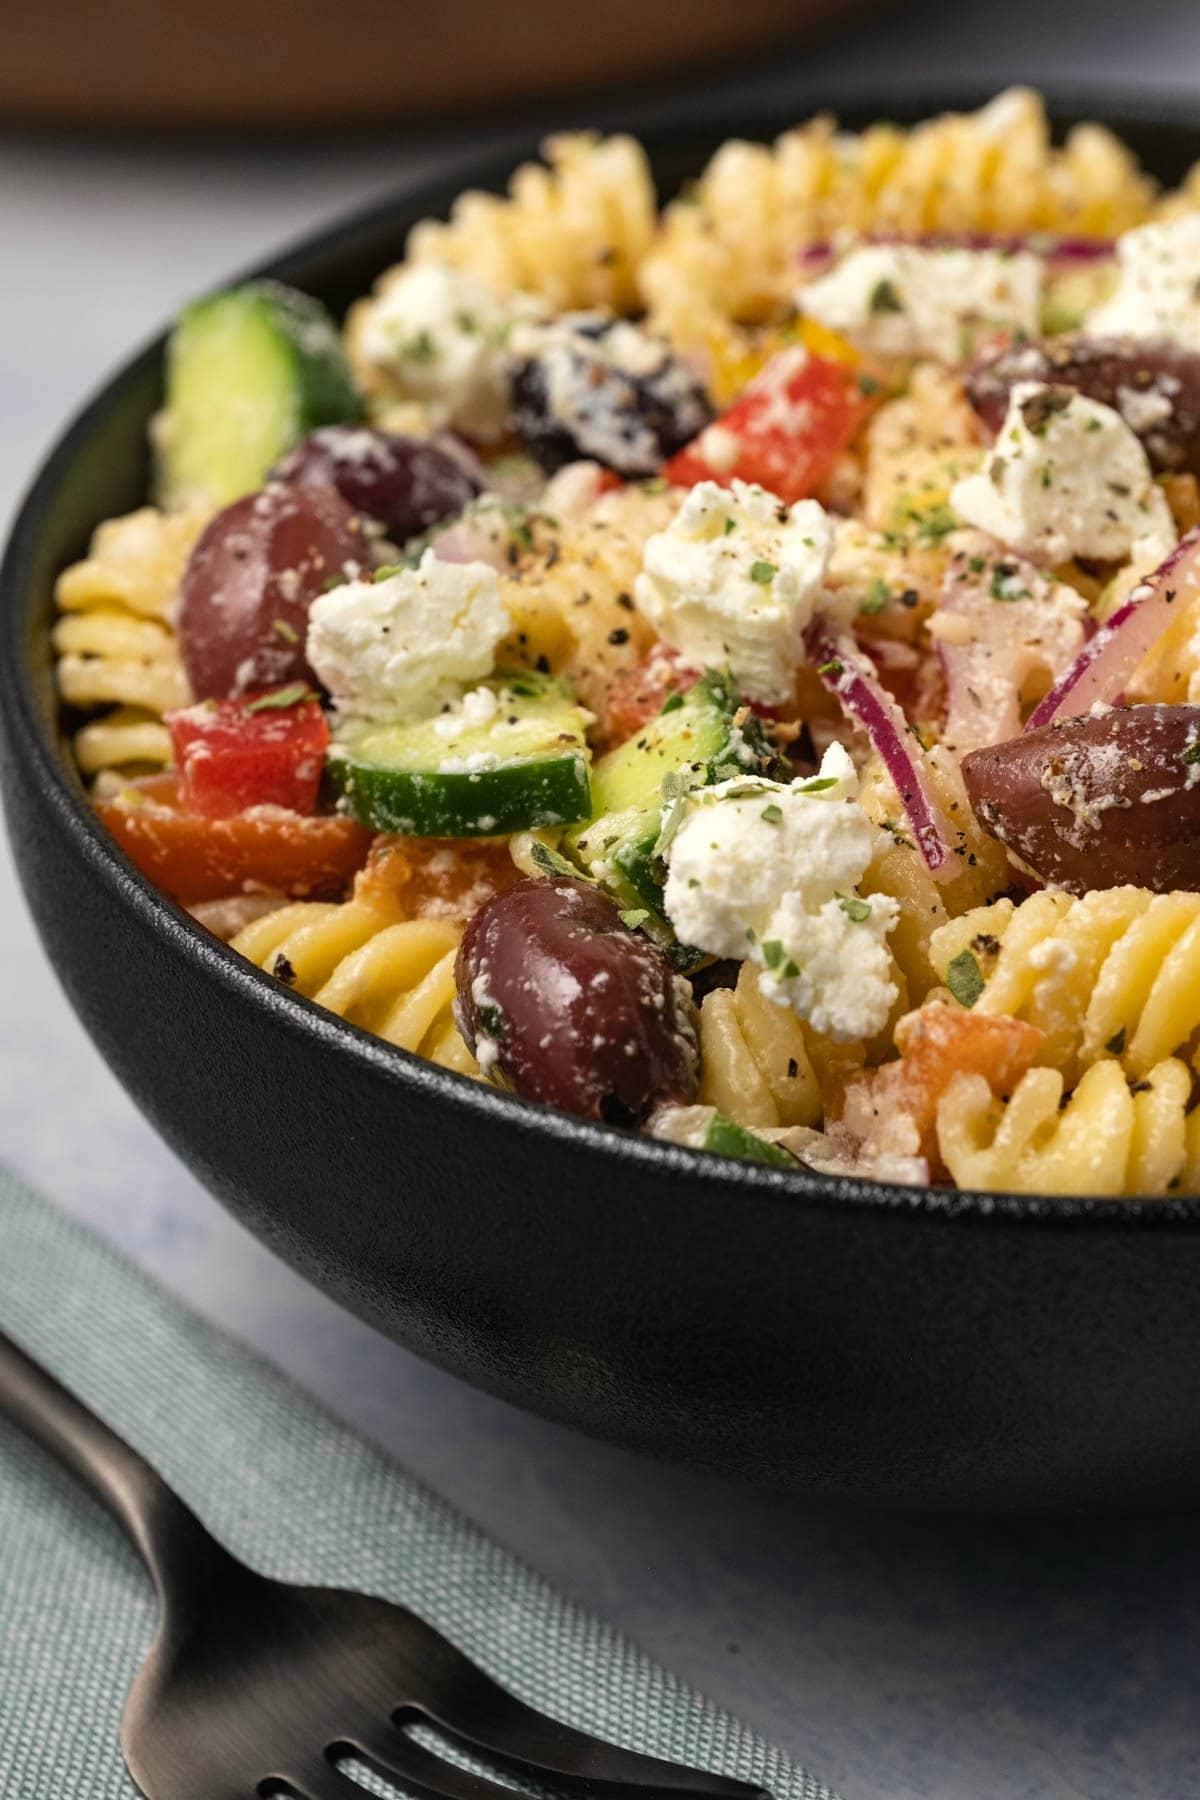 Greek pasta salad in a black bowl.